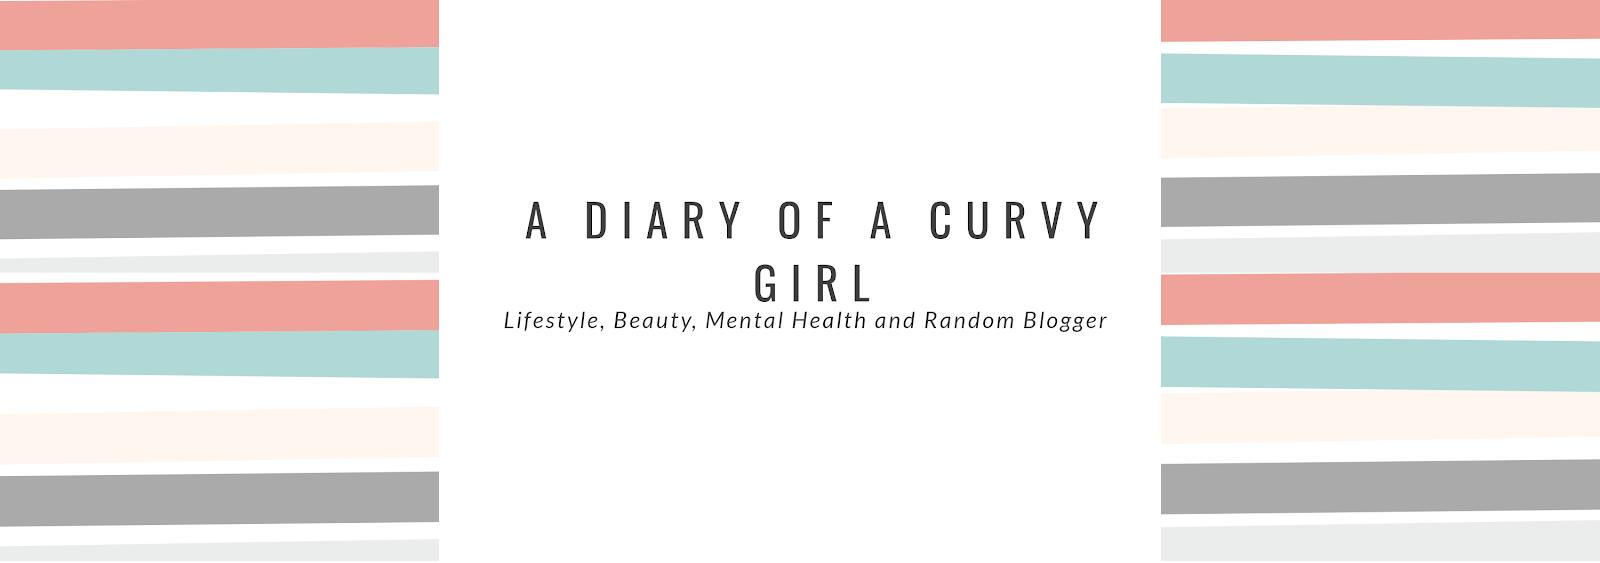 A Diary of a Curvy Girl